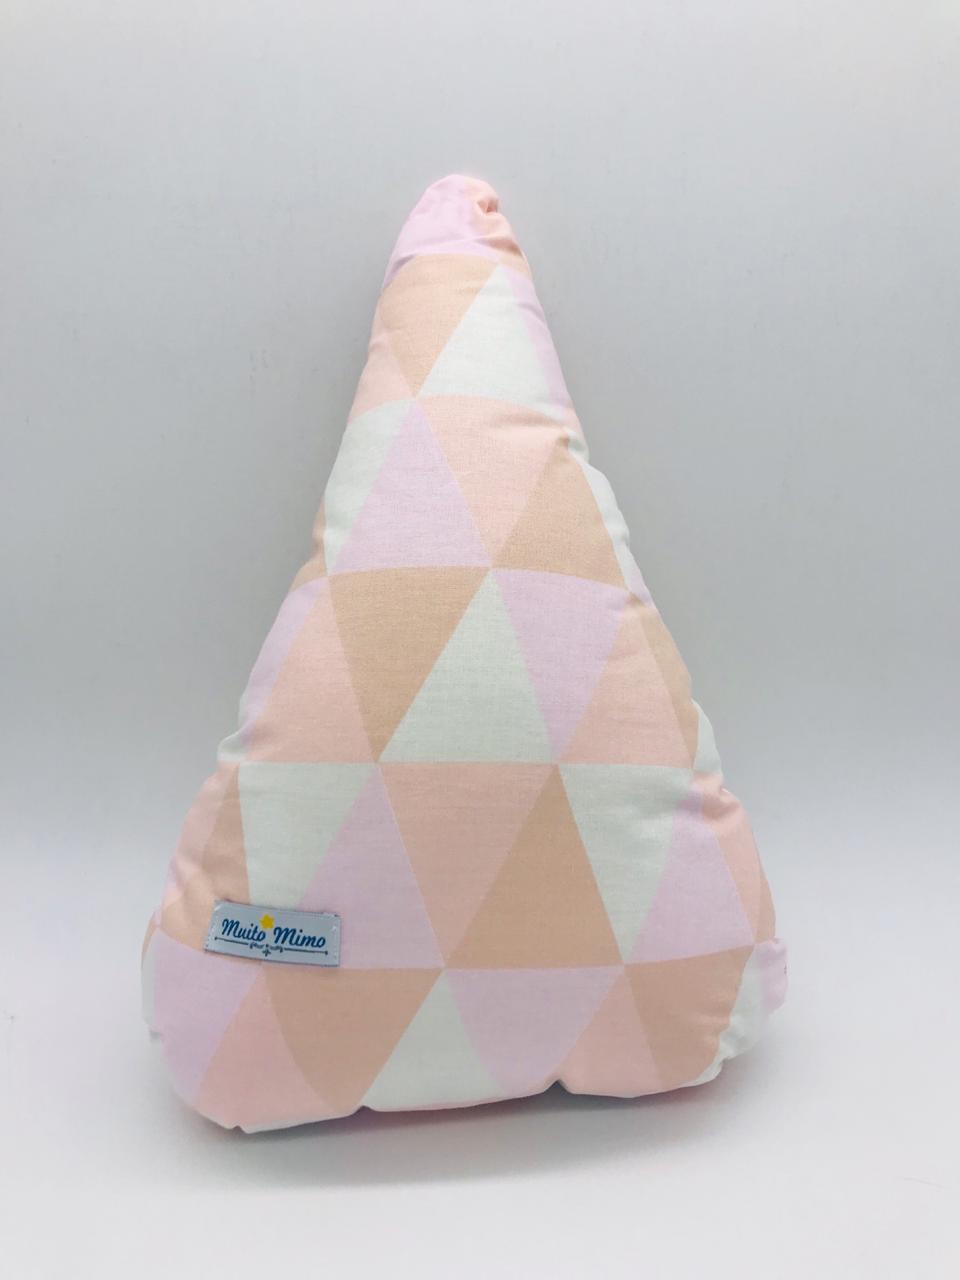 Almofada Gota Triangulo Rosa - m Mimo Minasrey Ref 5556